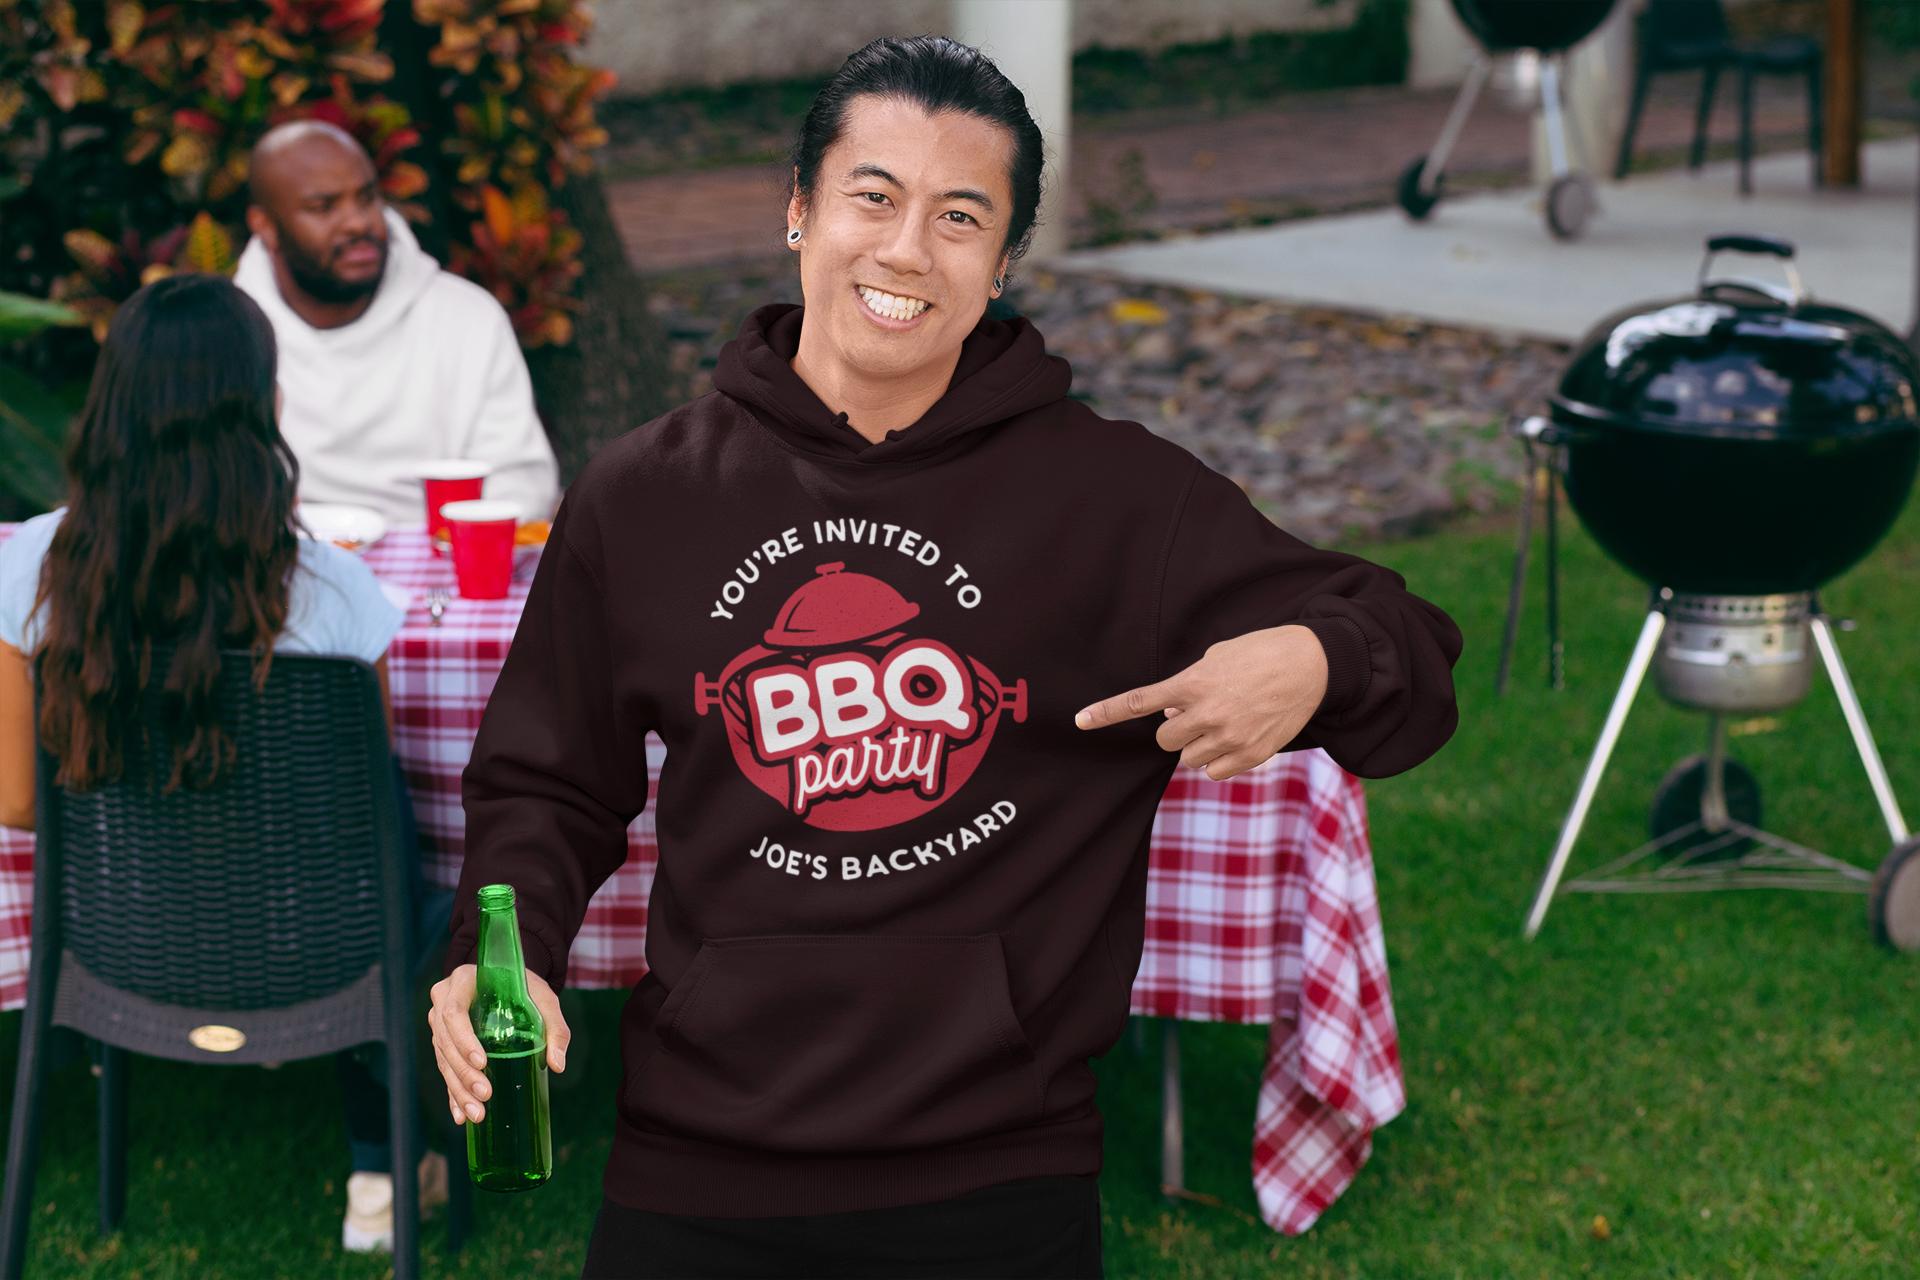 BBQ Party Logo Design TShirt. Retro Vector SVG Cut File example image 6